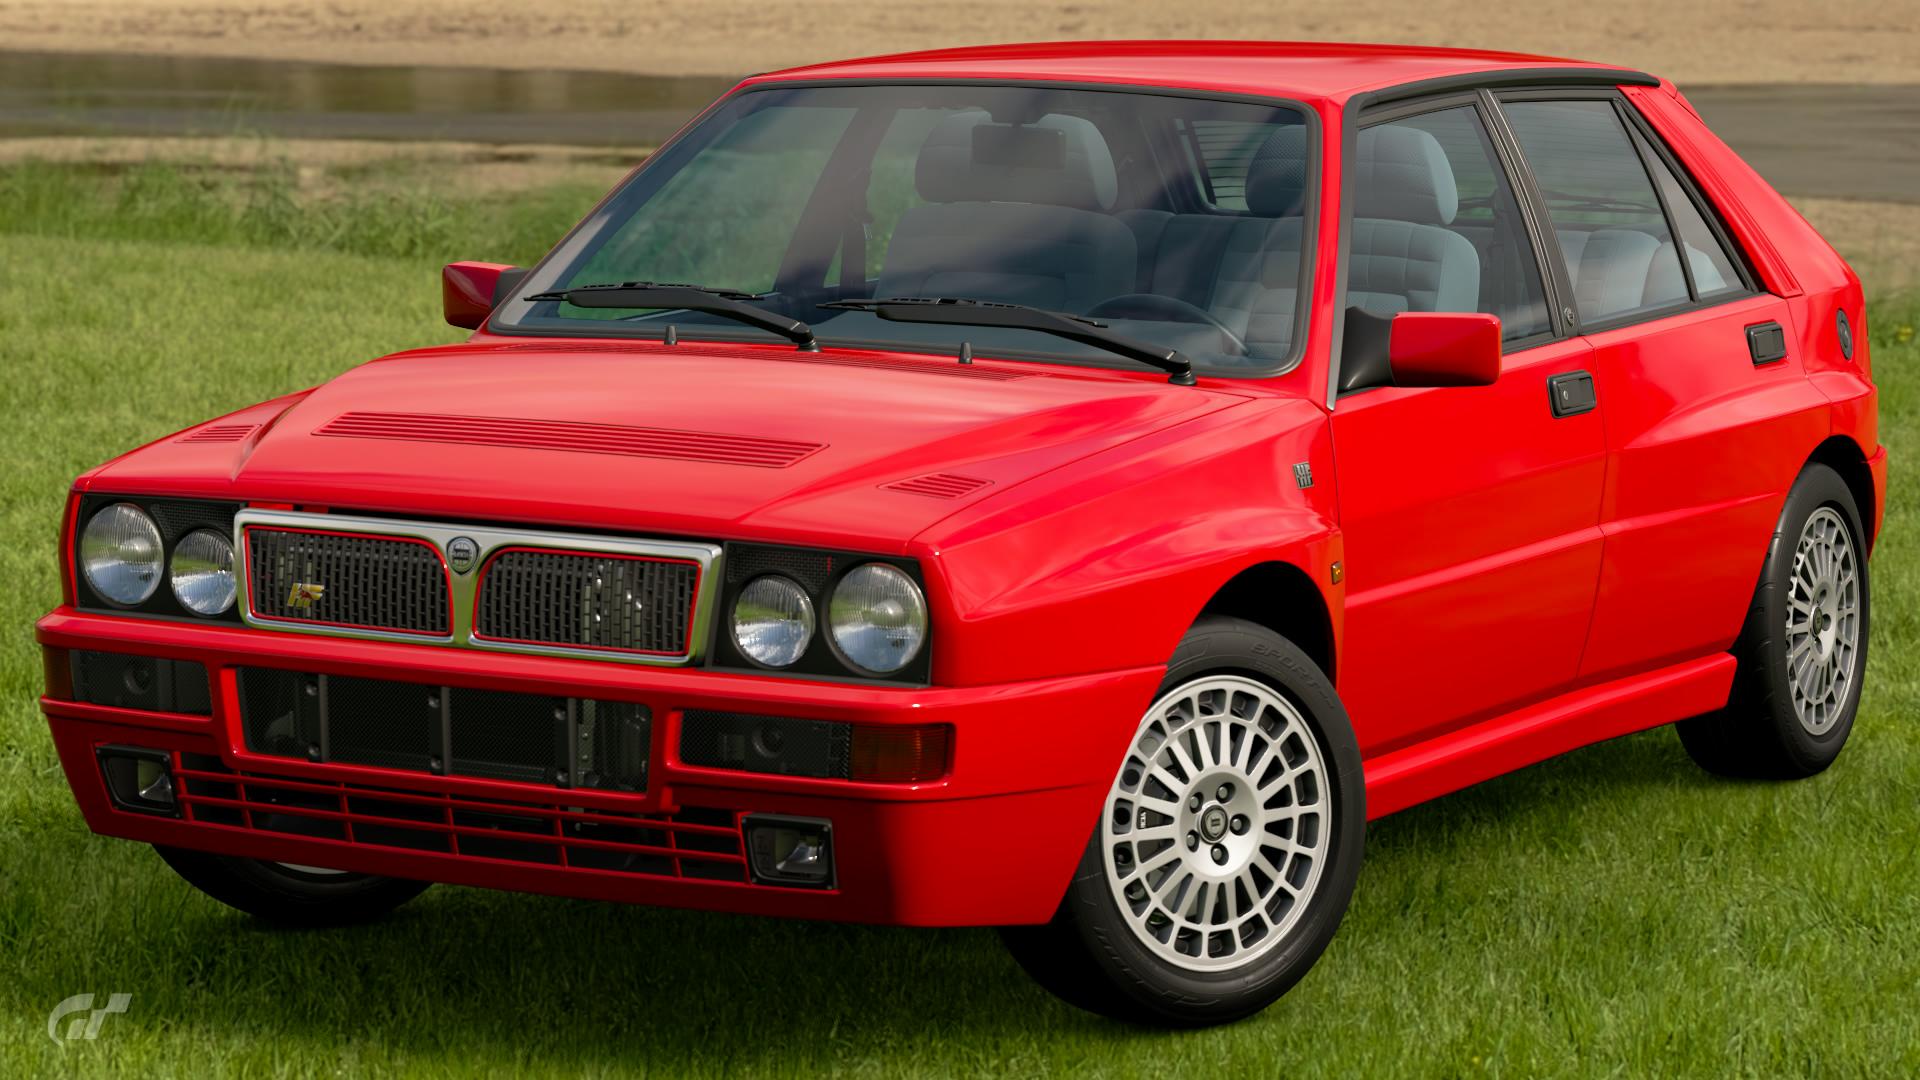 File:1994 Lancia Delta Integrale HF (7574707368).jpg